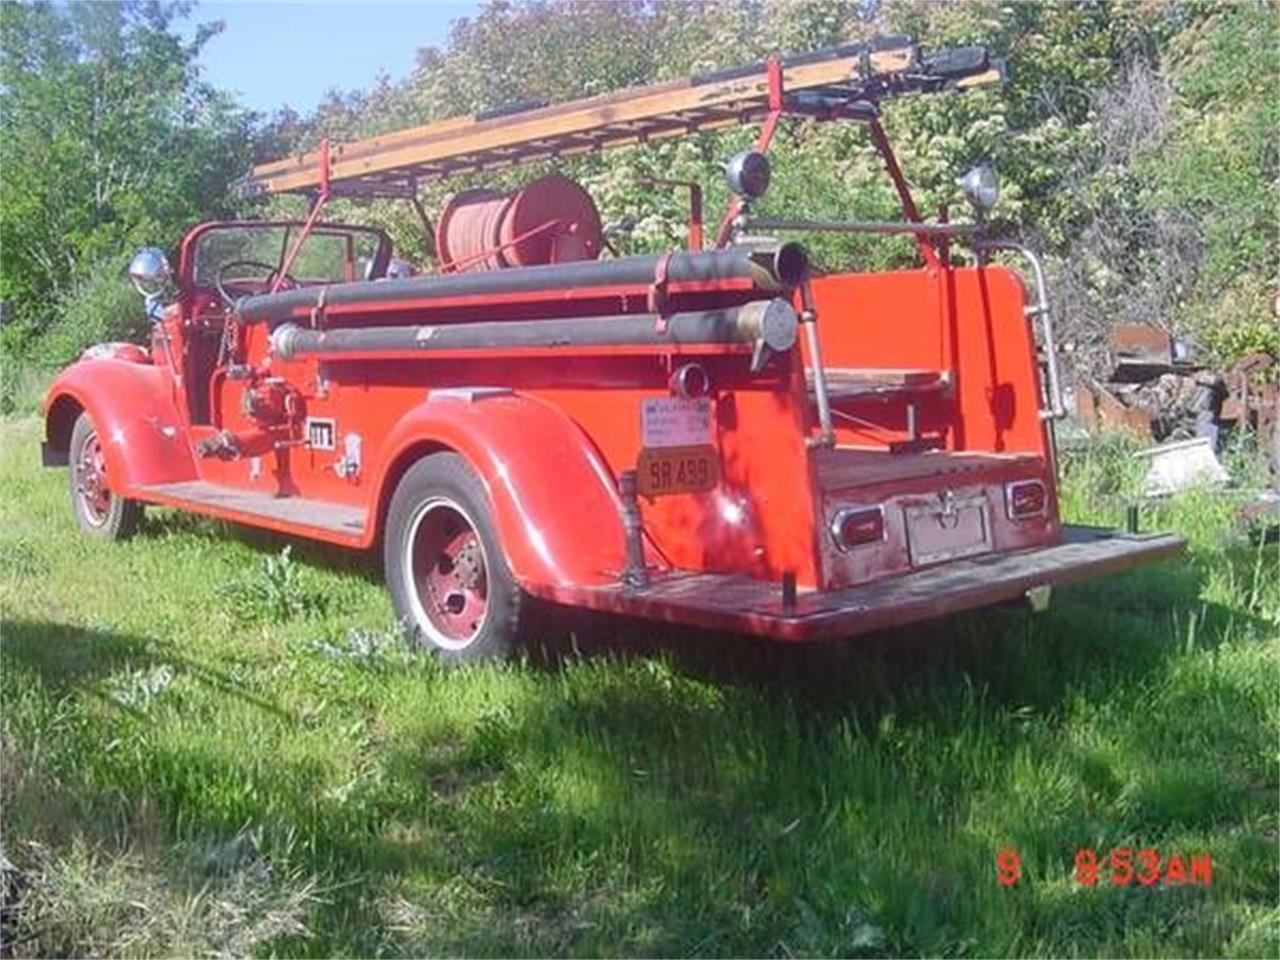 1940 GMC Fire Truck (CC-1120327) for sale in Cadillac, Michigan